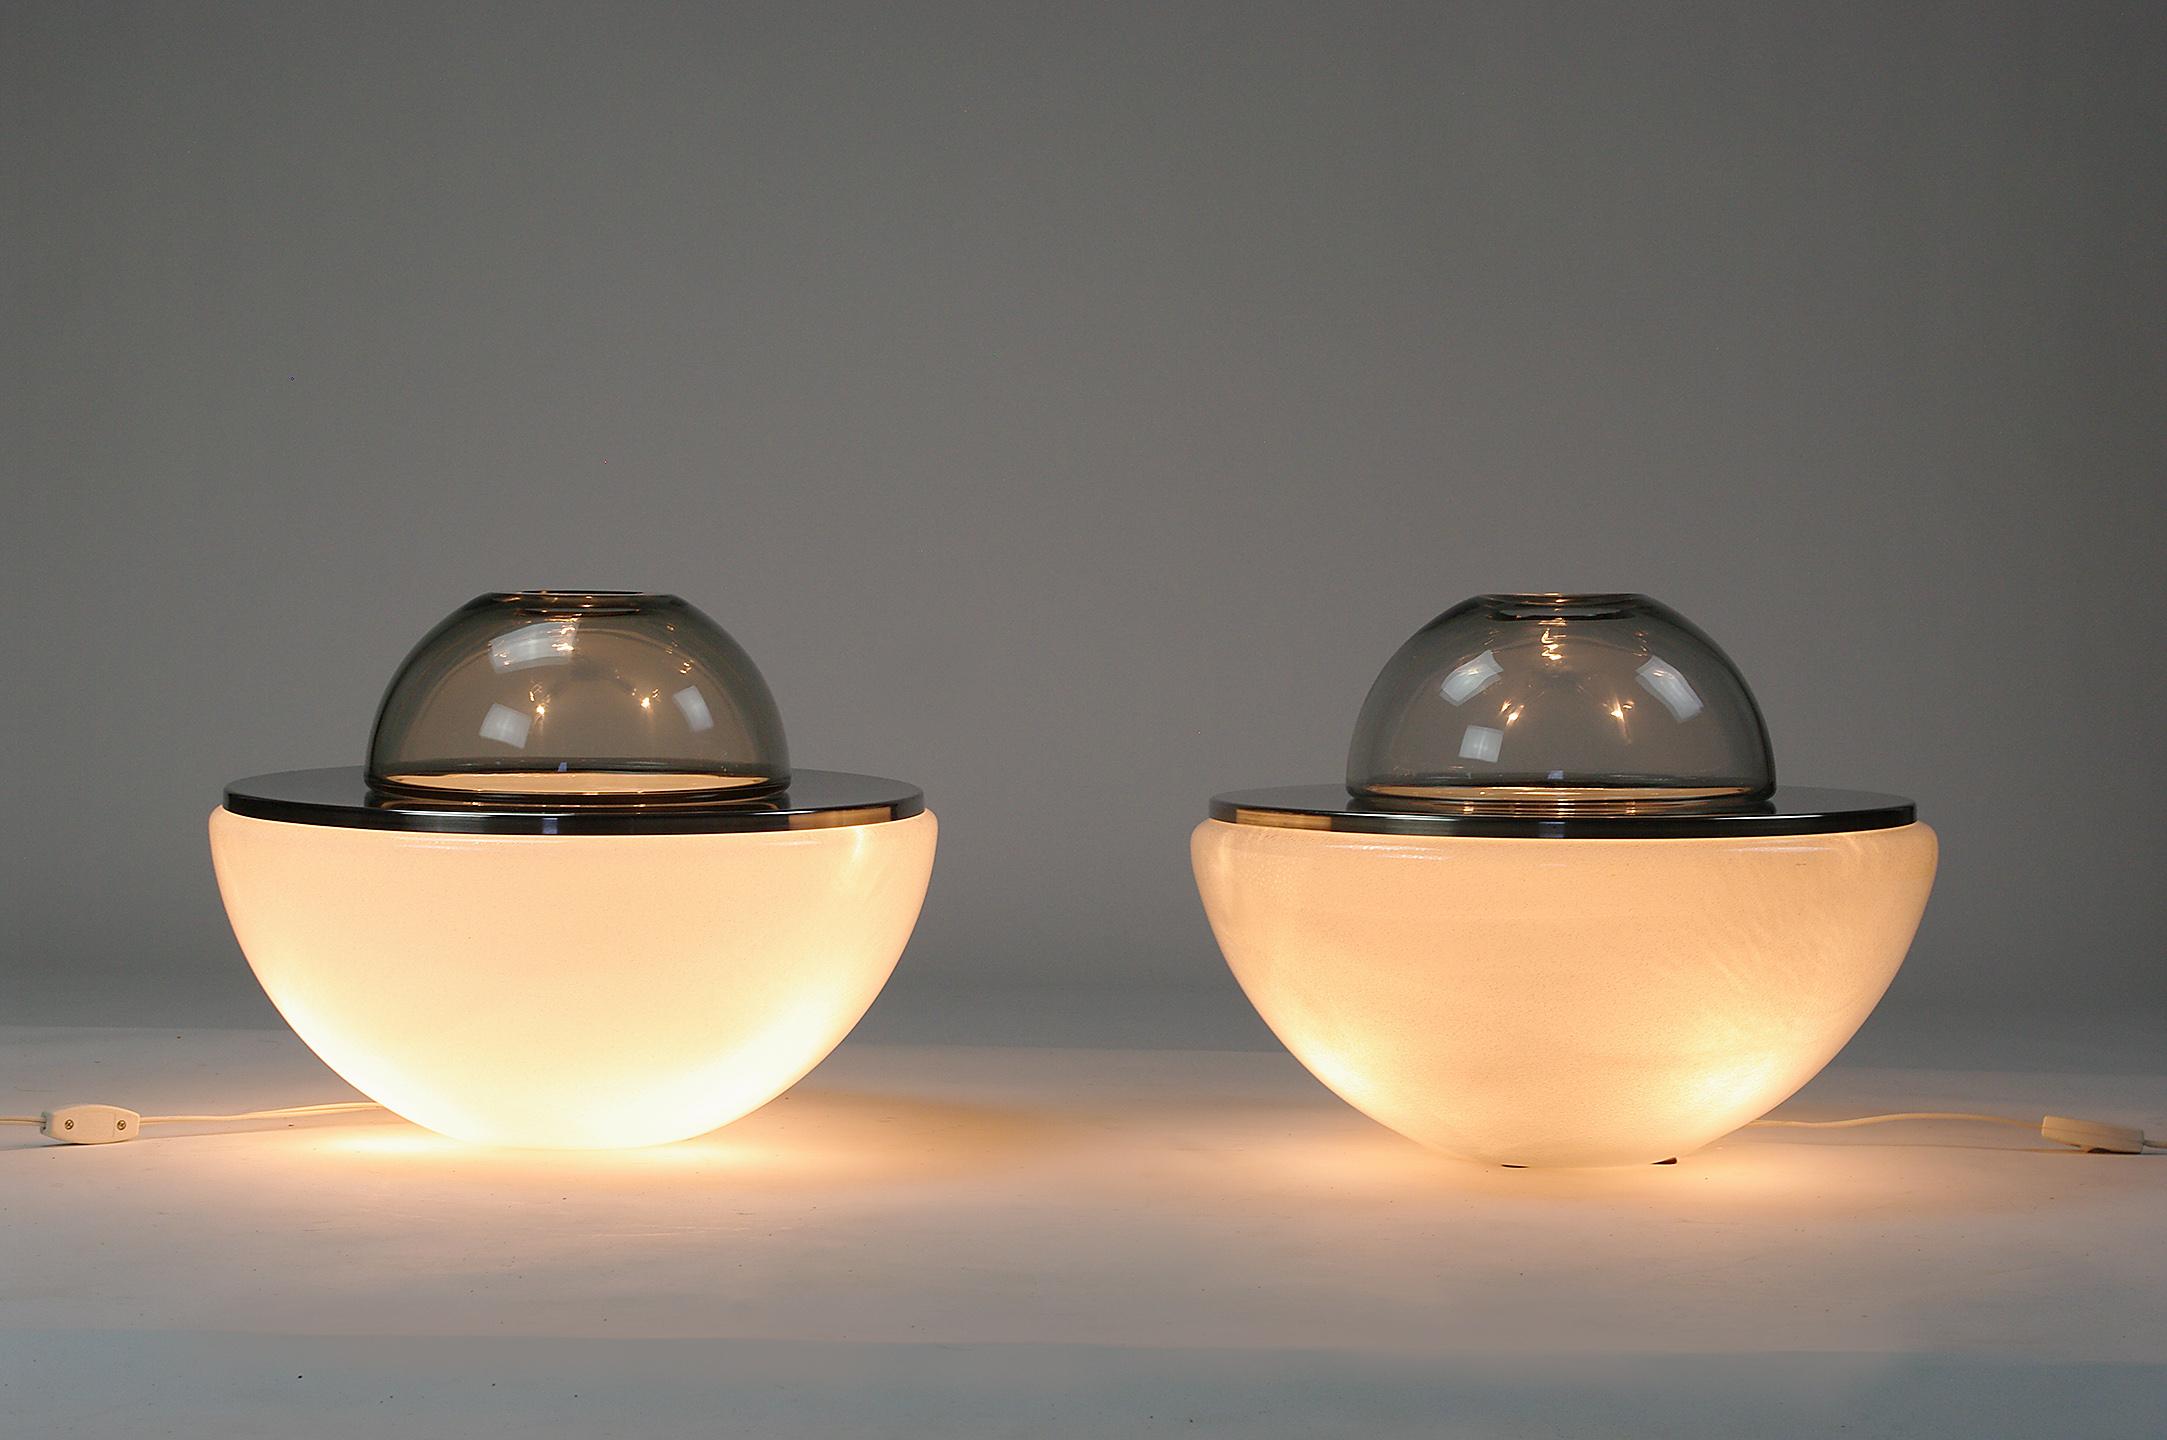 Murano-lamps-Lit-1.jpg